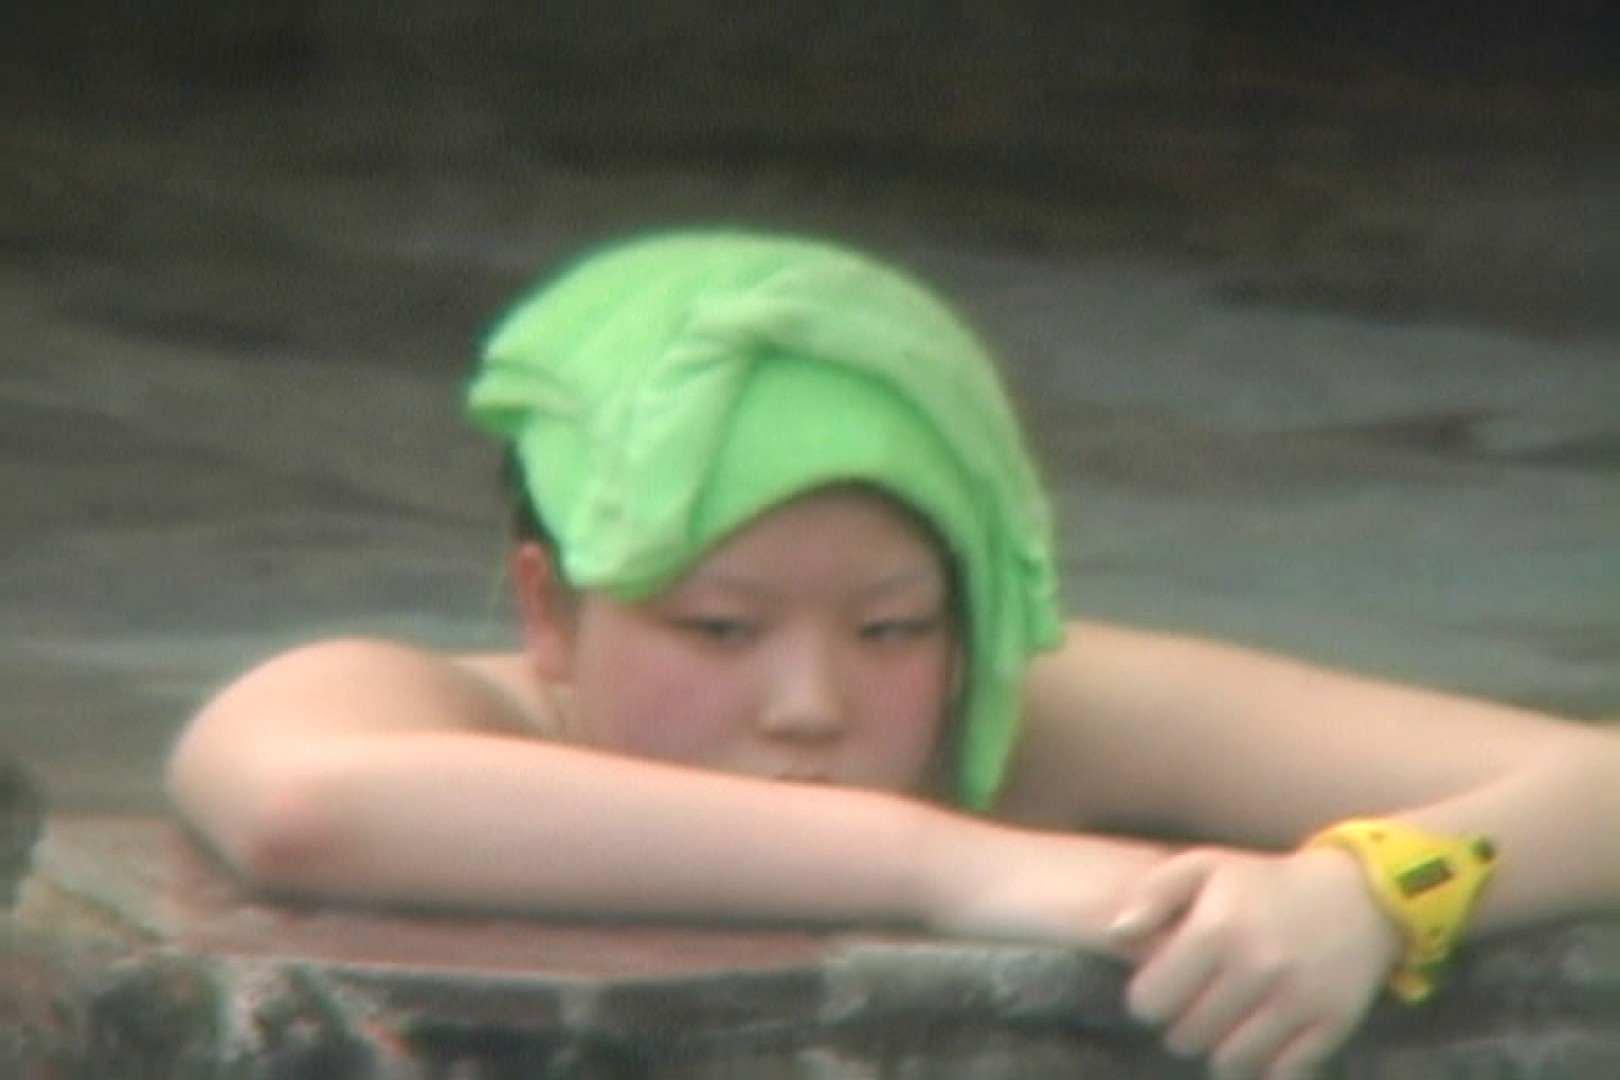 Aquaな露天風呂Vol.563 OLセックス 盗撮動画紹介 92画像 17